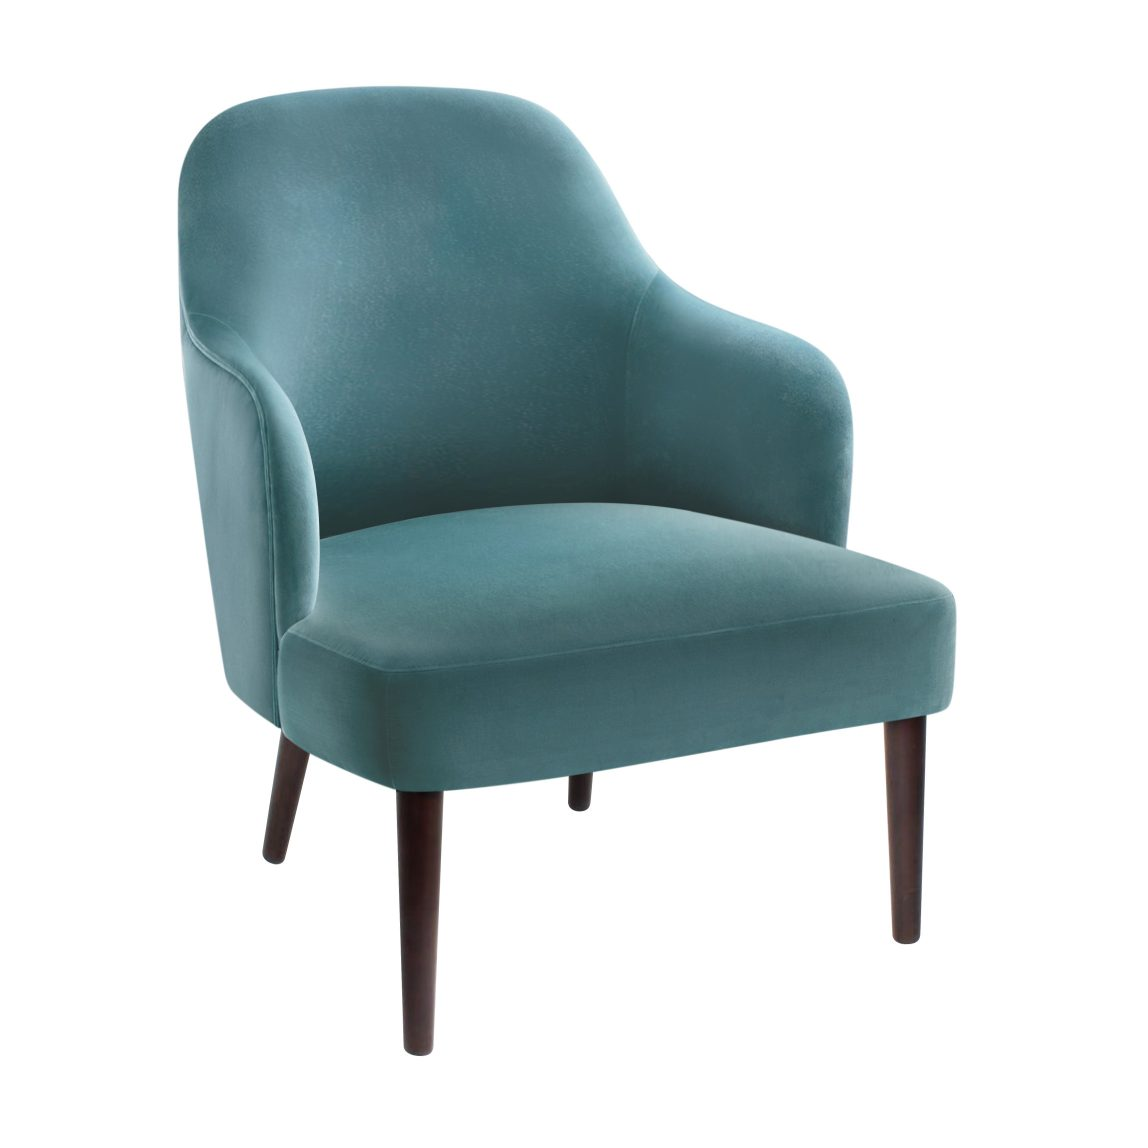 кресло бархатное мягкая мебель на заказ